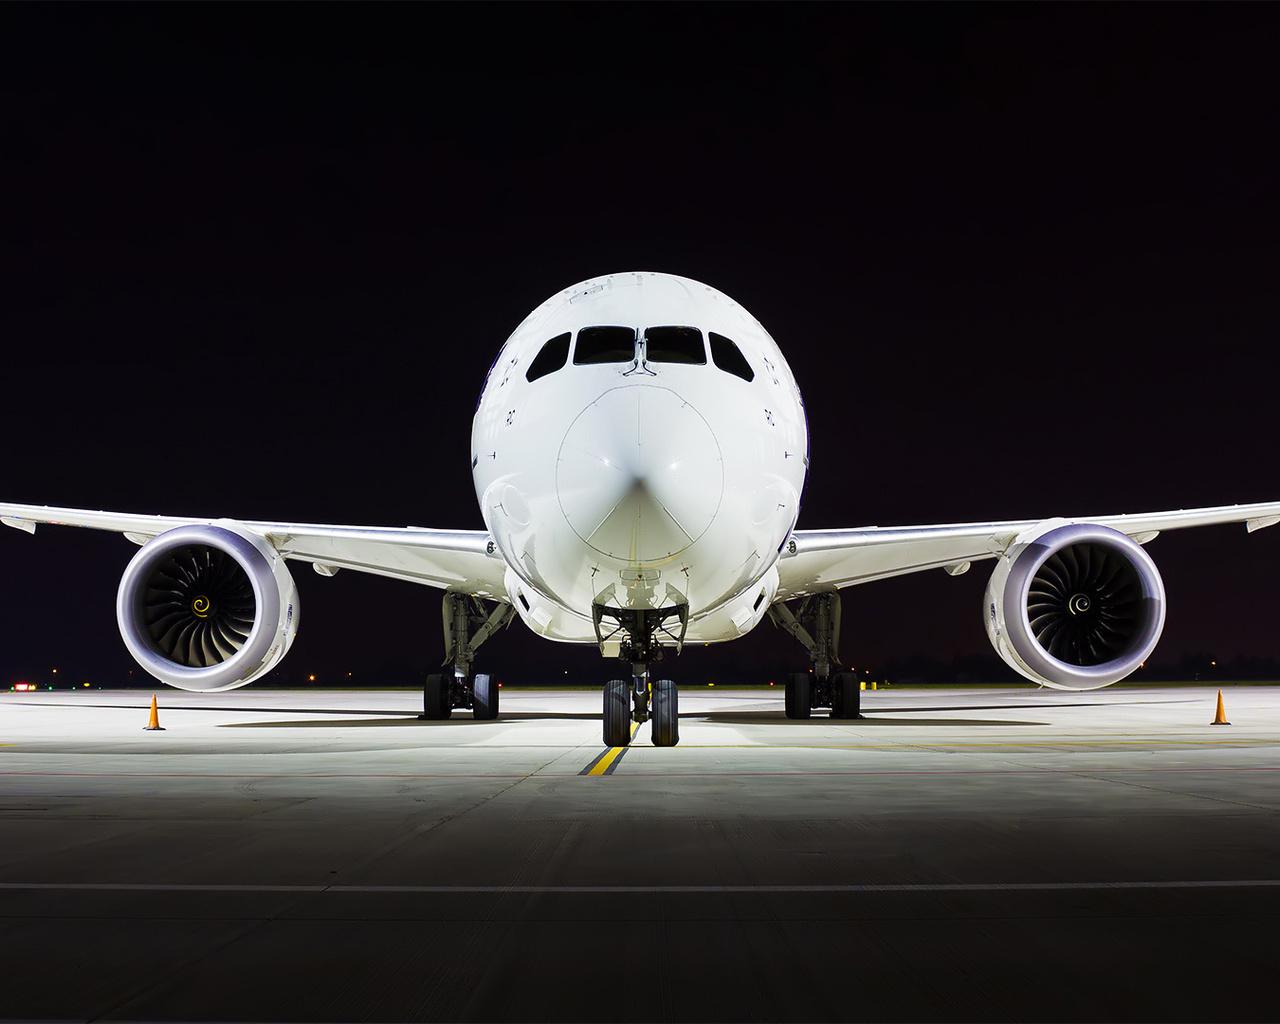 boeing 787, b787, dream)liner, самолёт, аэропорт, вечер, ночь